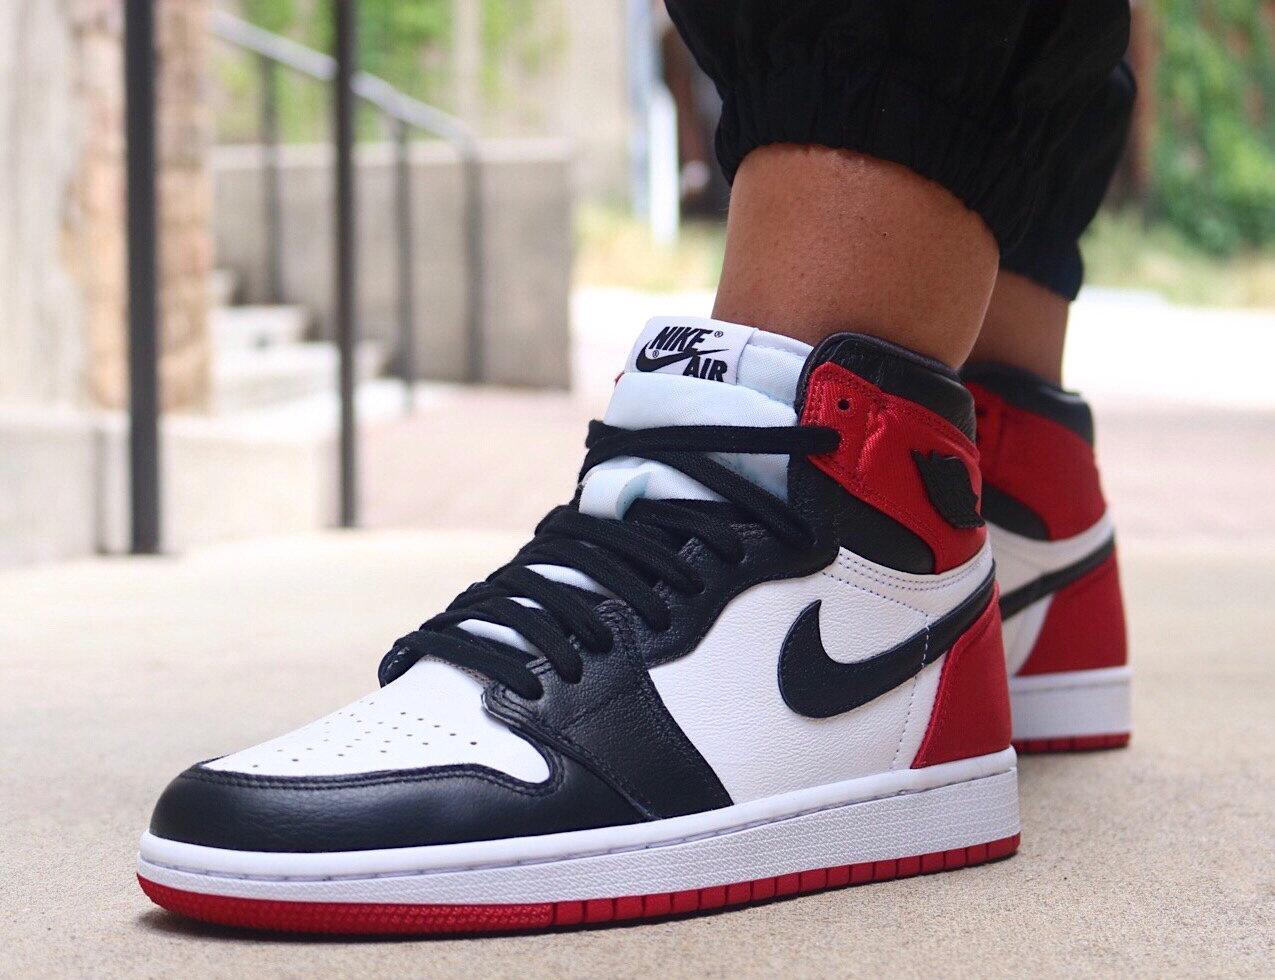 "competitive price 5cd86 6d329 Sneaker Release : Womens Air Jordan 1 Retro High OG ""Satin ..."